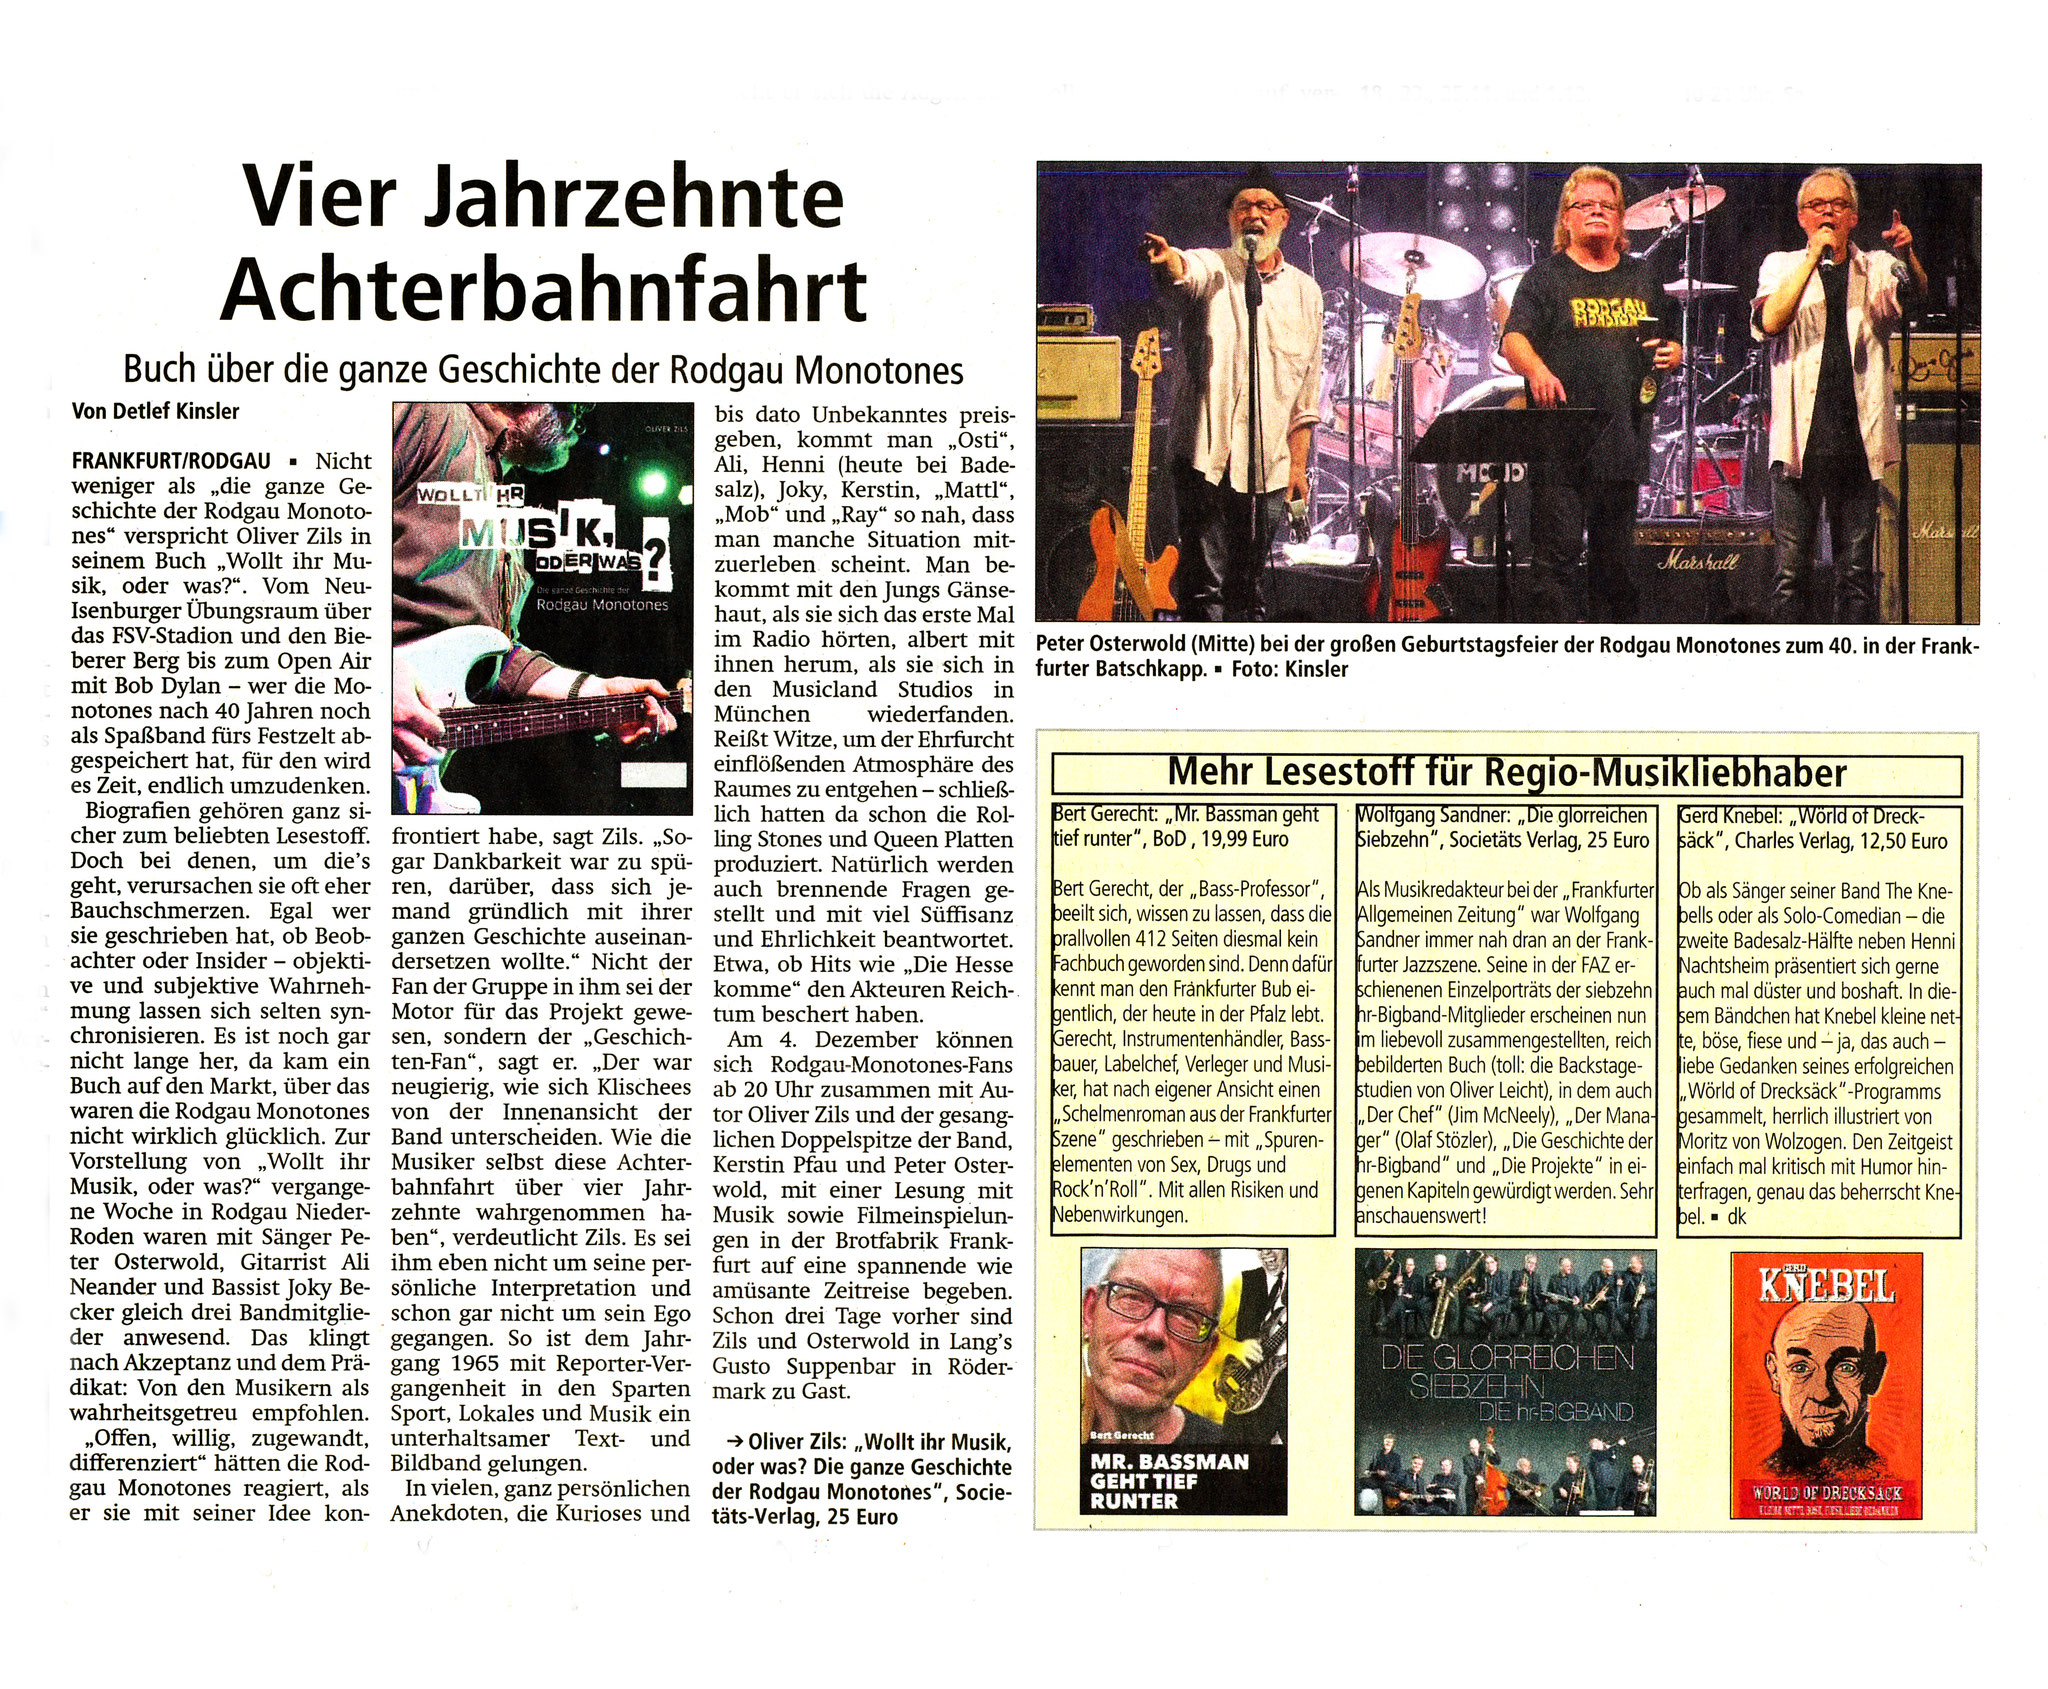 Offenbach Post, 30. Oktober 2018